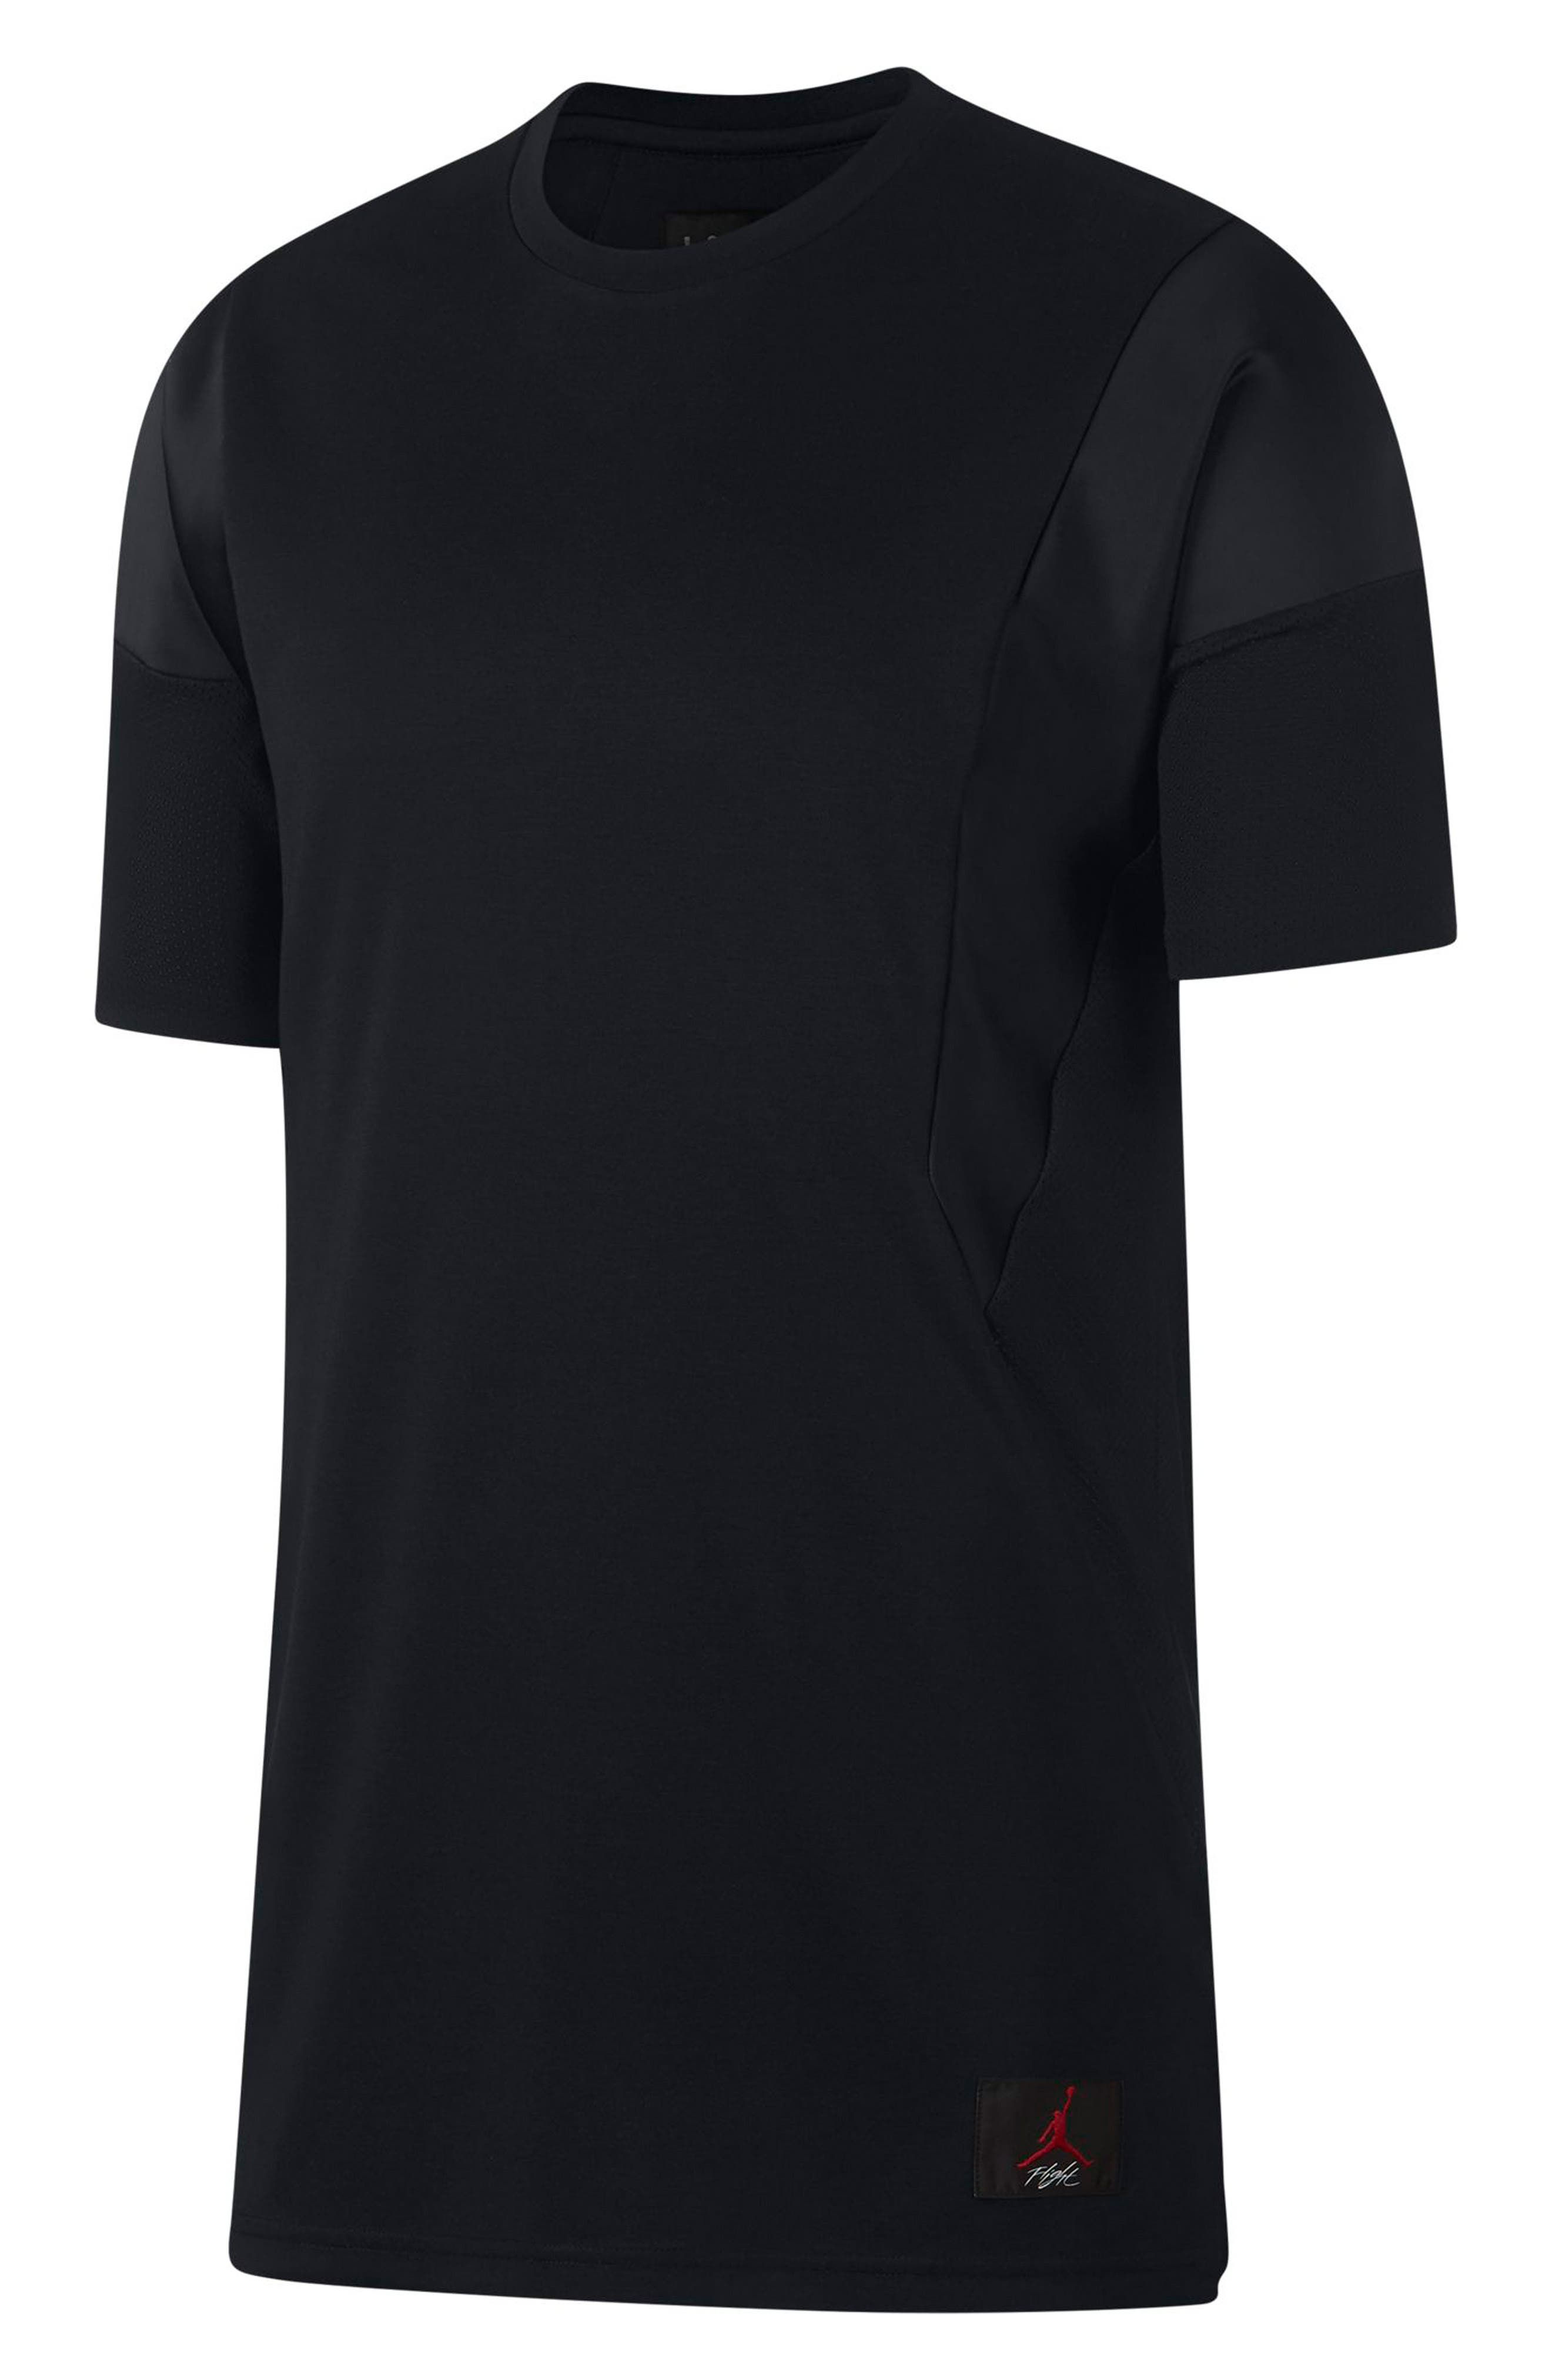 Flight T-Shirt, Main, color, BLACK/ BLACK/ BLACK